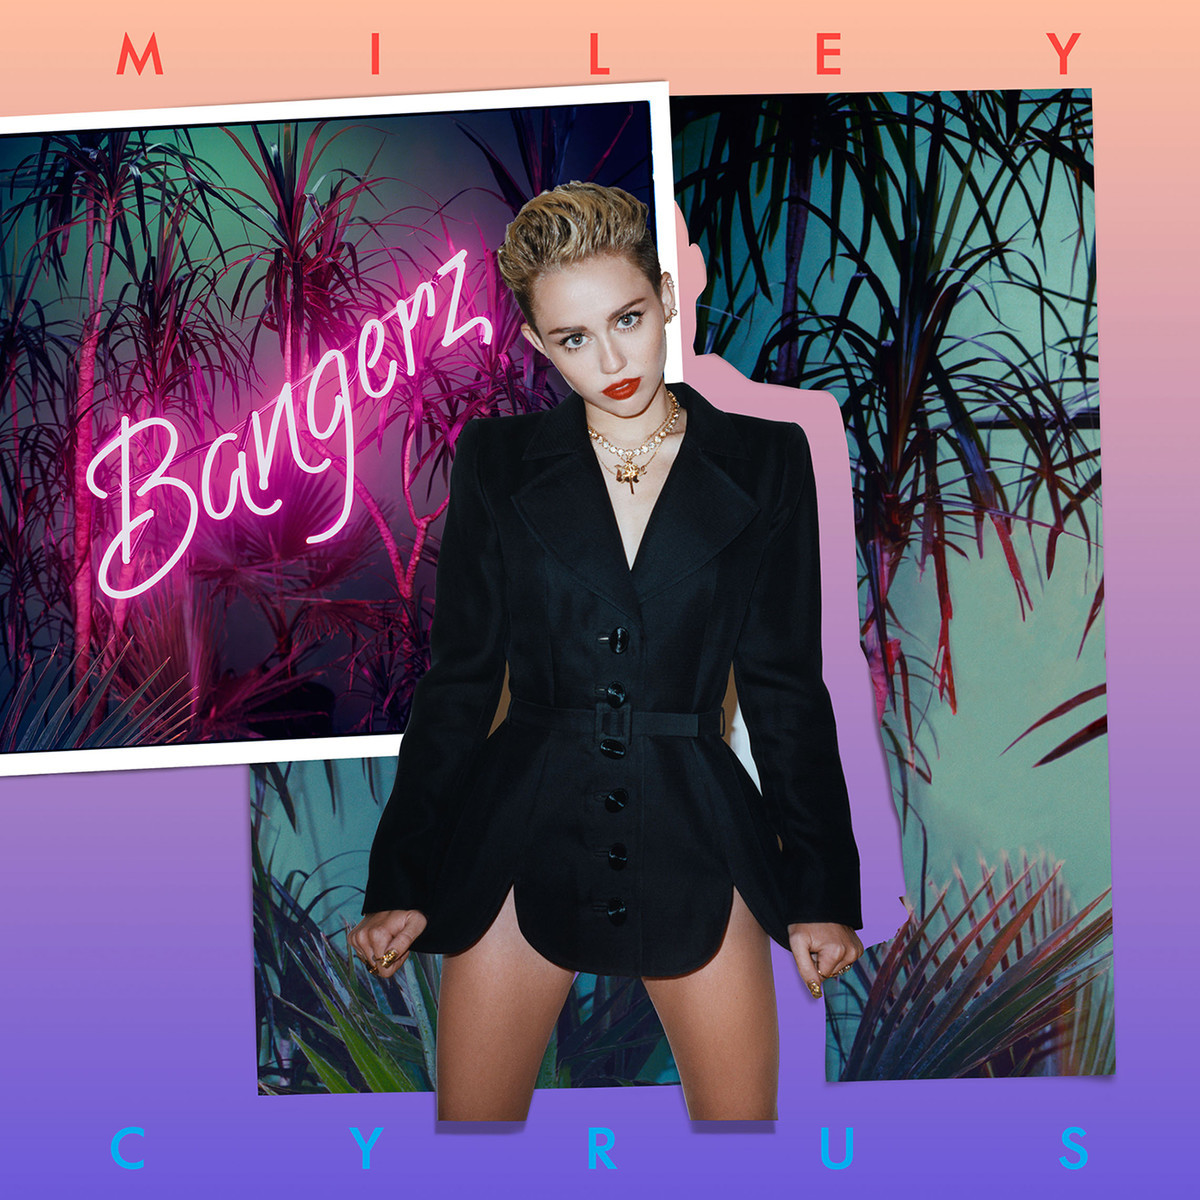 Bangerz Miley Cyrus.jpg